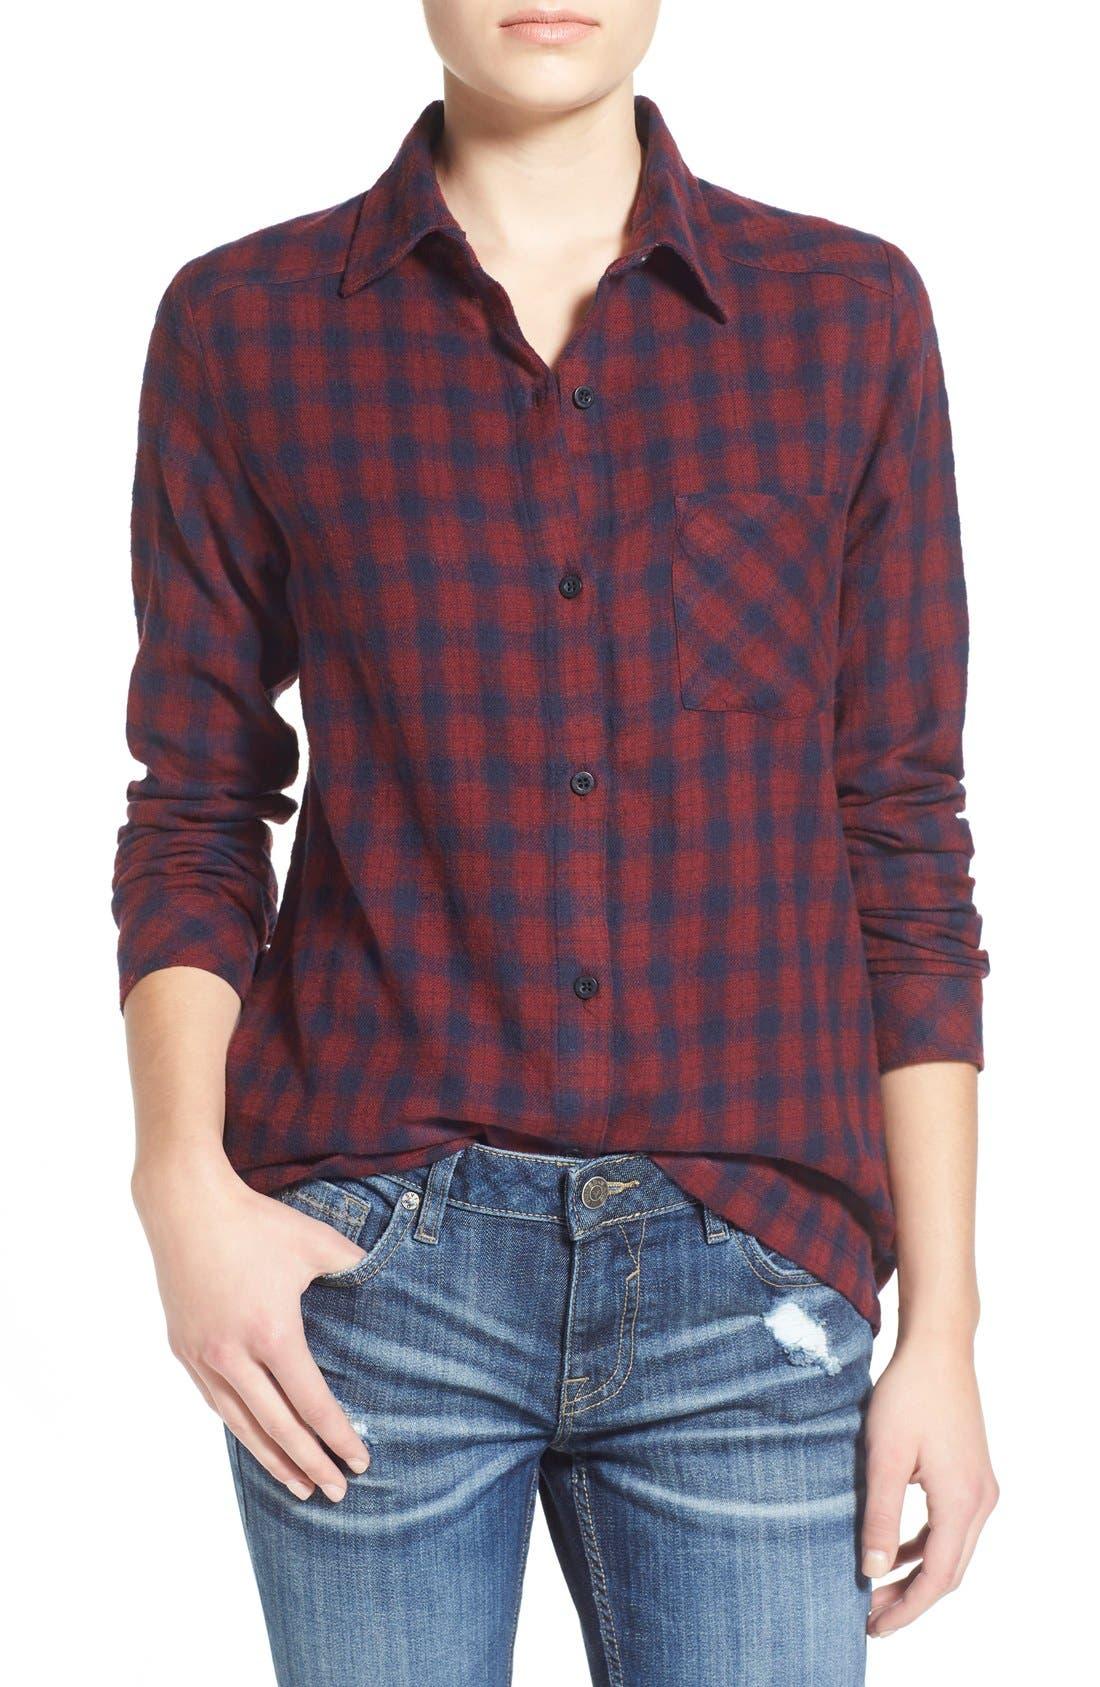 Alternate Image 1 Selected - RVCA'Jig 2'Plaid Shirt